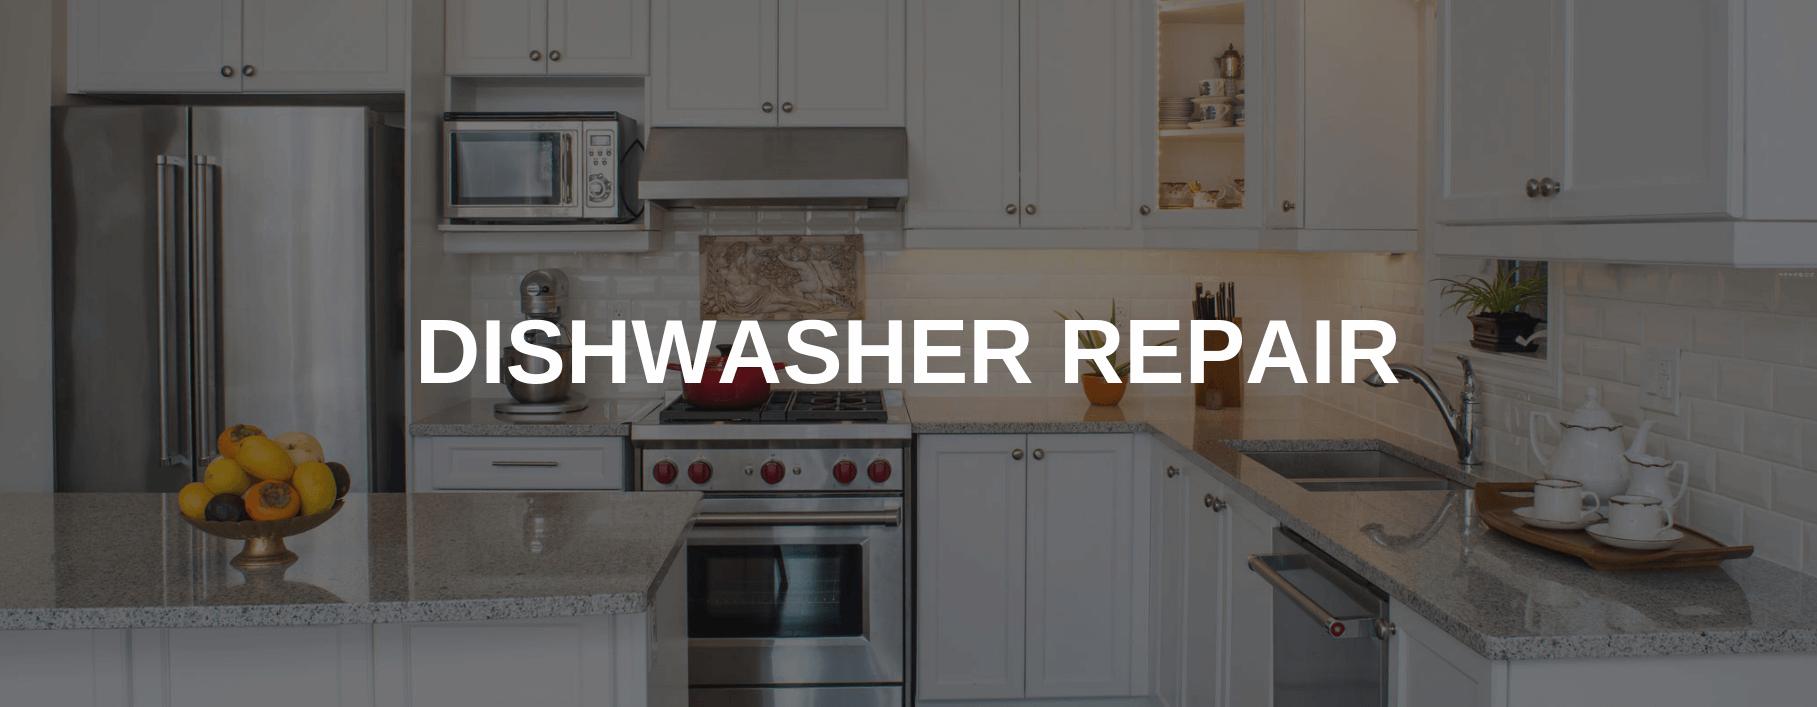 dishwasher repair groton